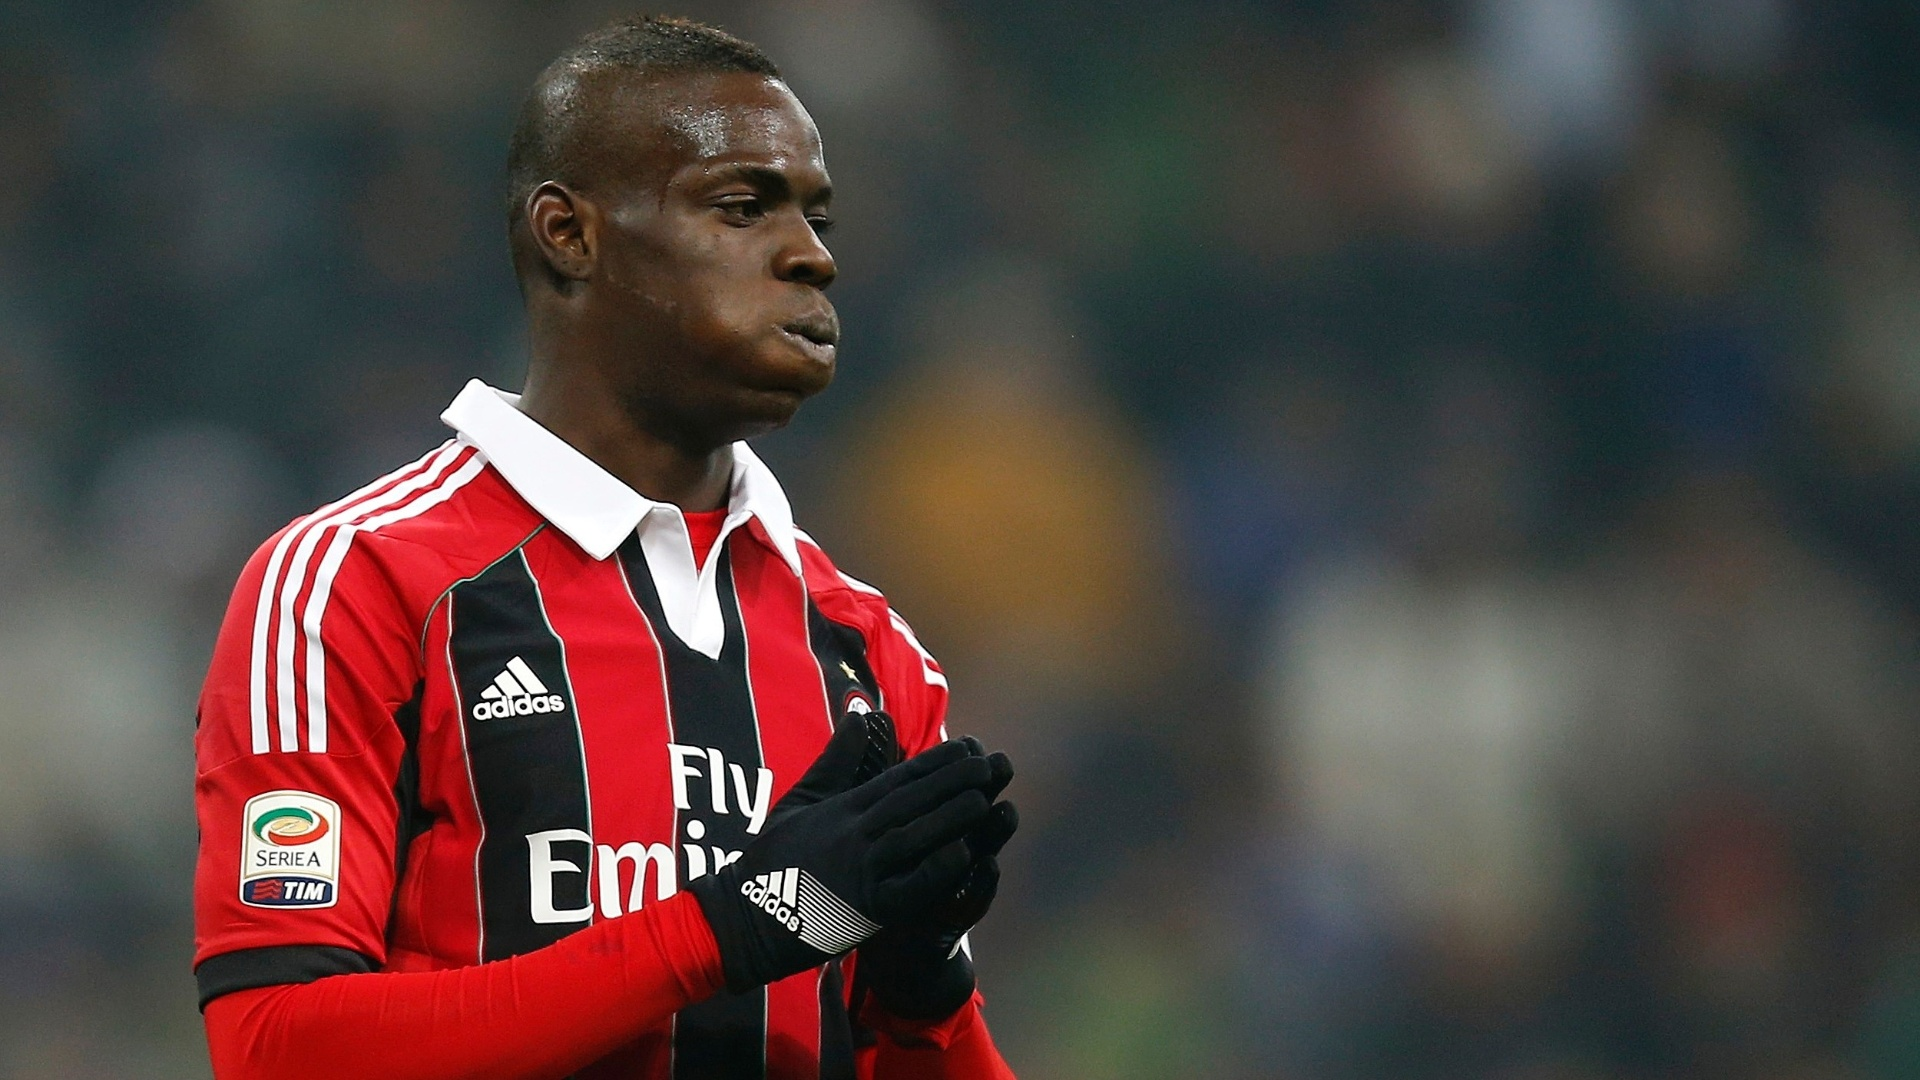 24.fev.2013 - Balotelli lamenta chance perdida no empate entre Milan e Inter de Milão por 1 a 1